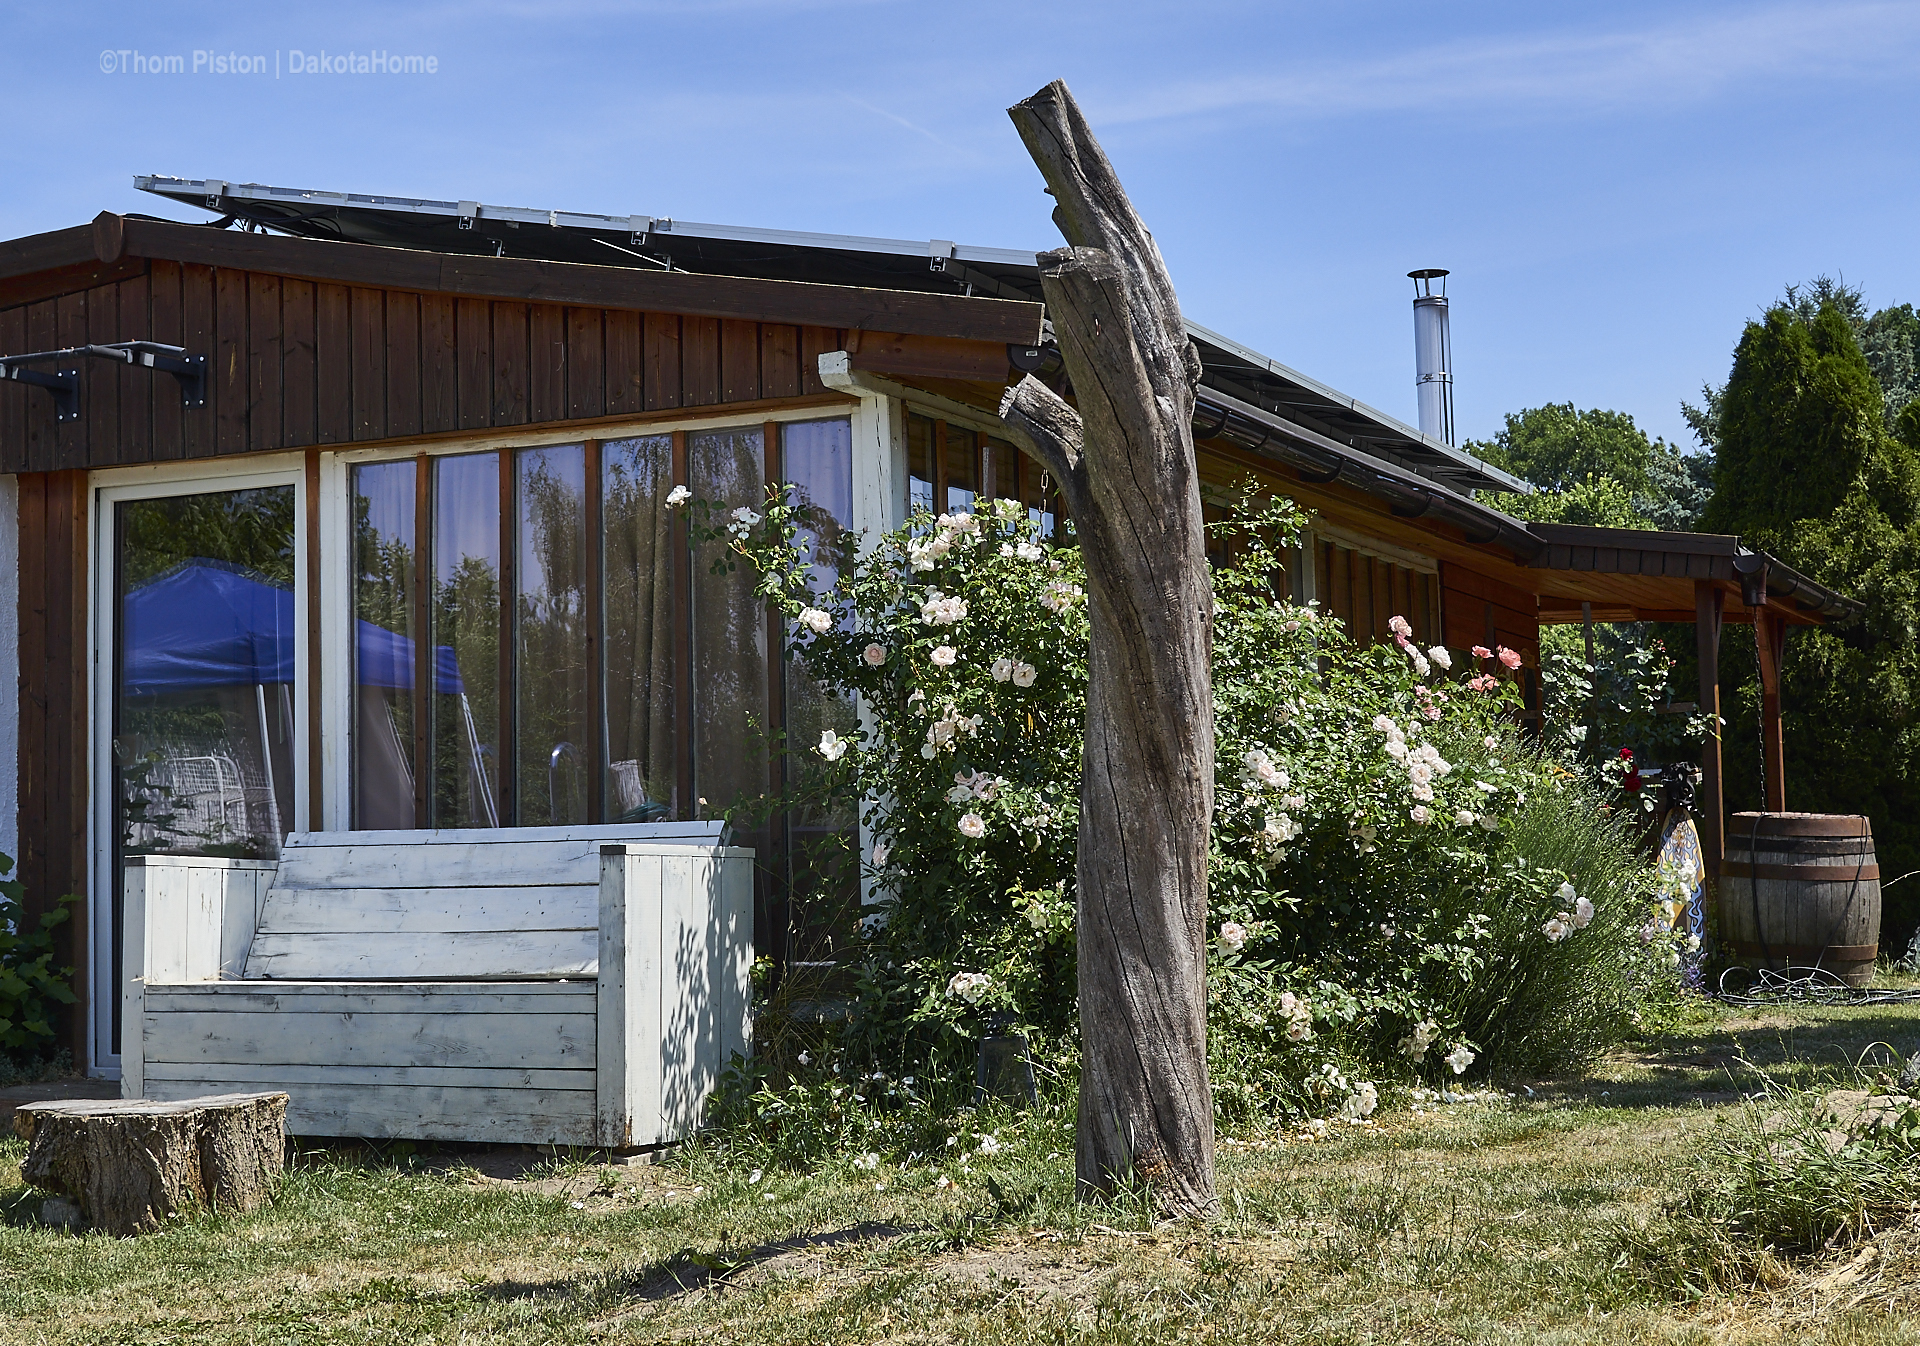 Unsere Rosen at Dakota Home, Juni 2019, Brandenburg